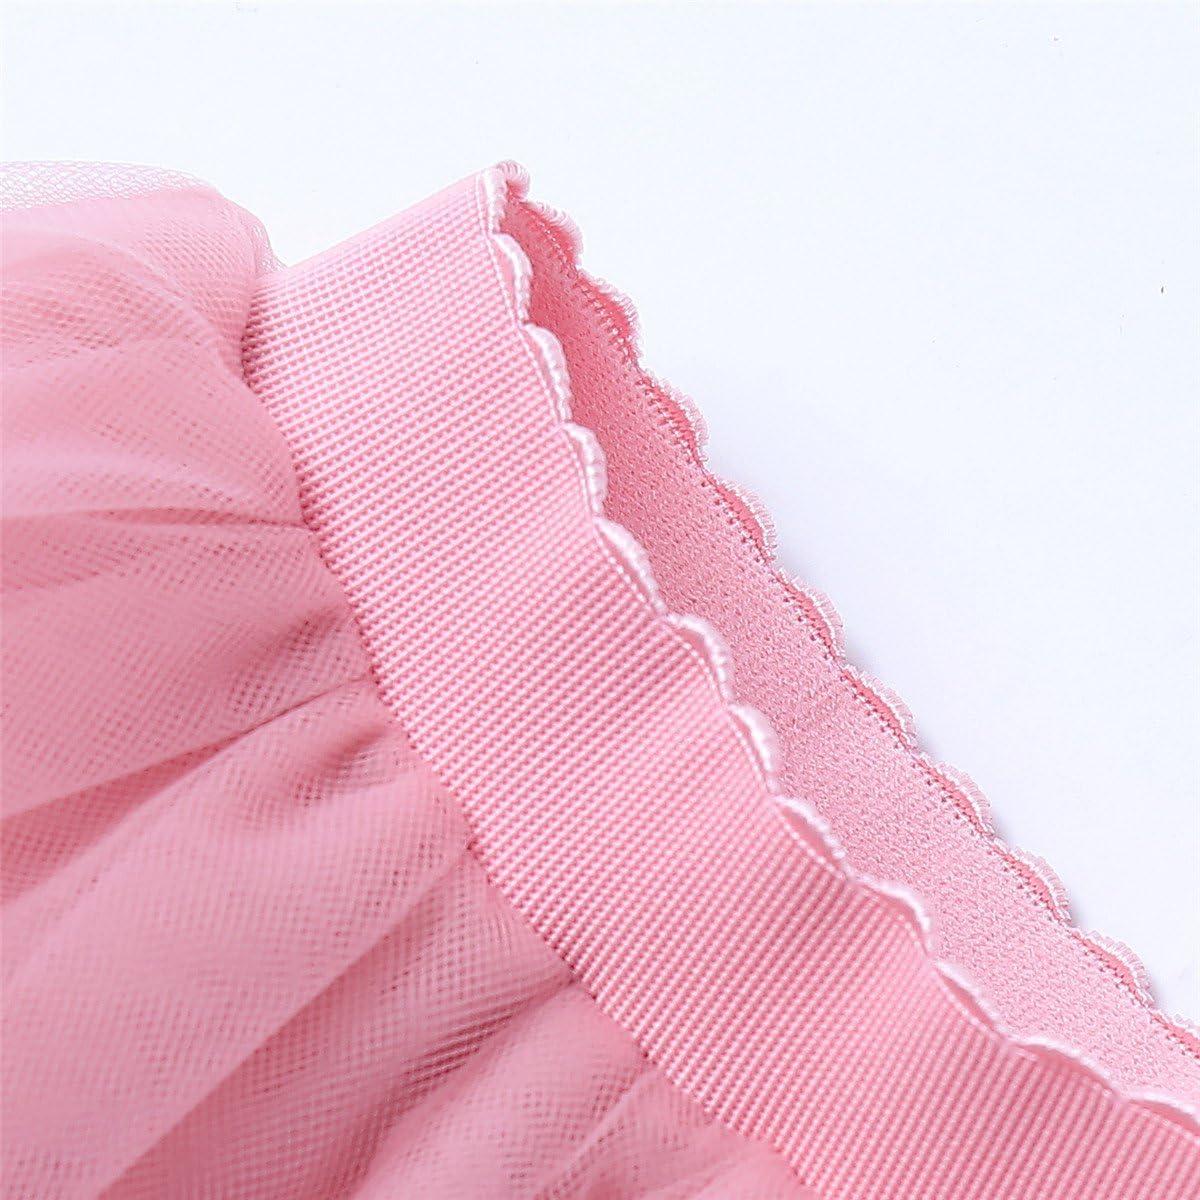 ShowYeu Damen Mid Calf Petticoat A-Linie Tutu T/üllrock Party Abschlussball Jupe Saias Brautjungfernkleid